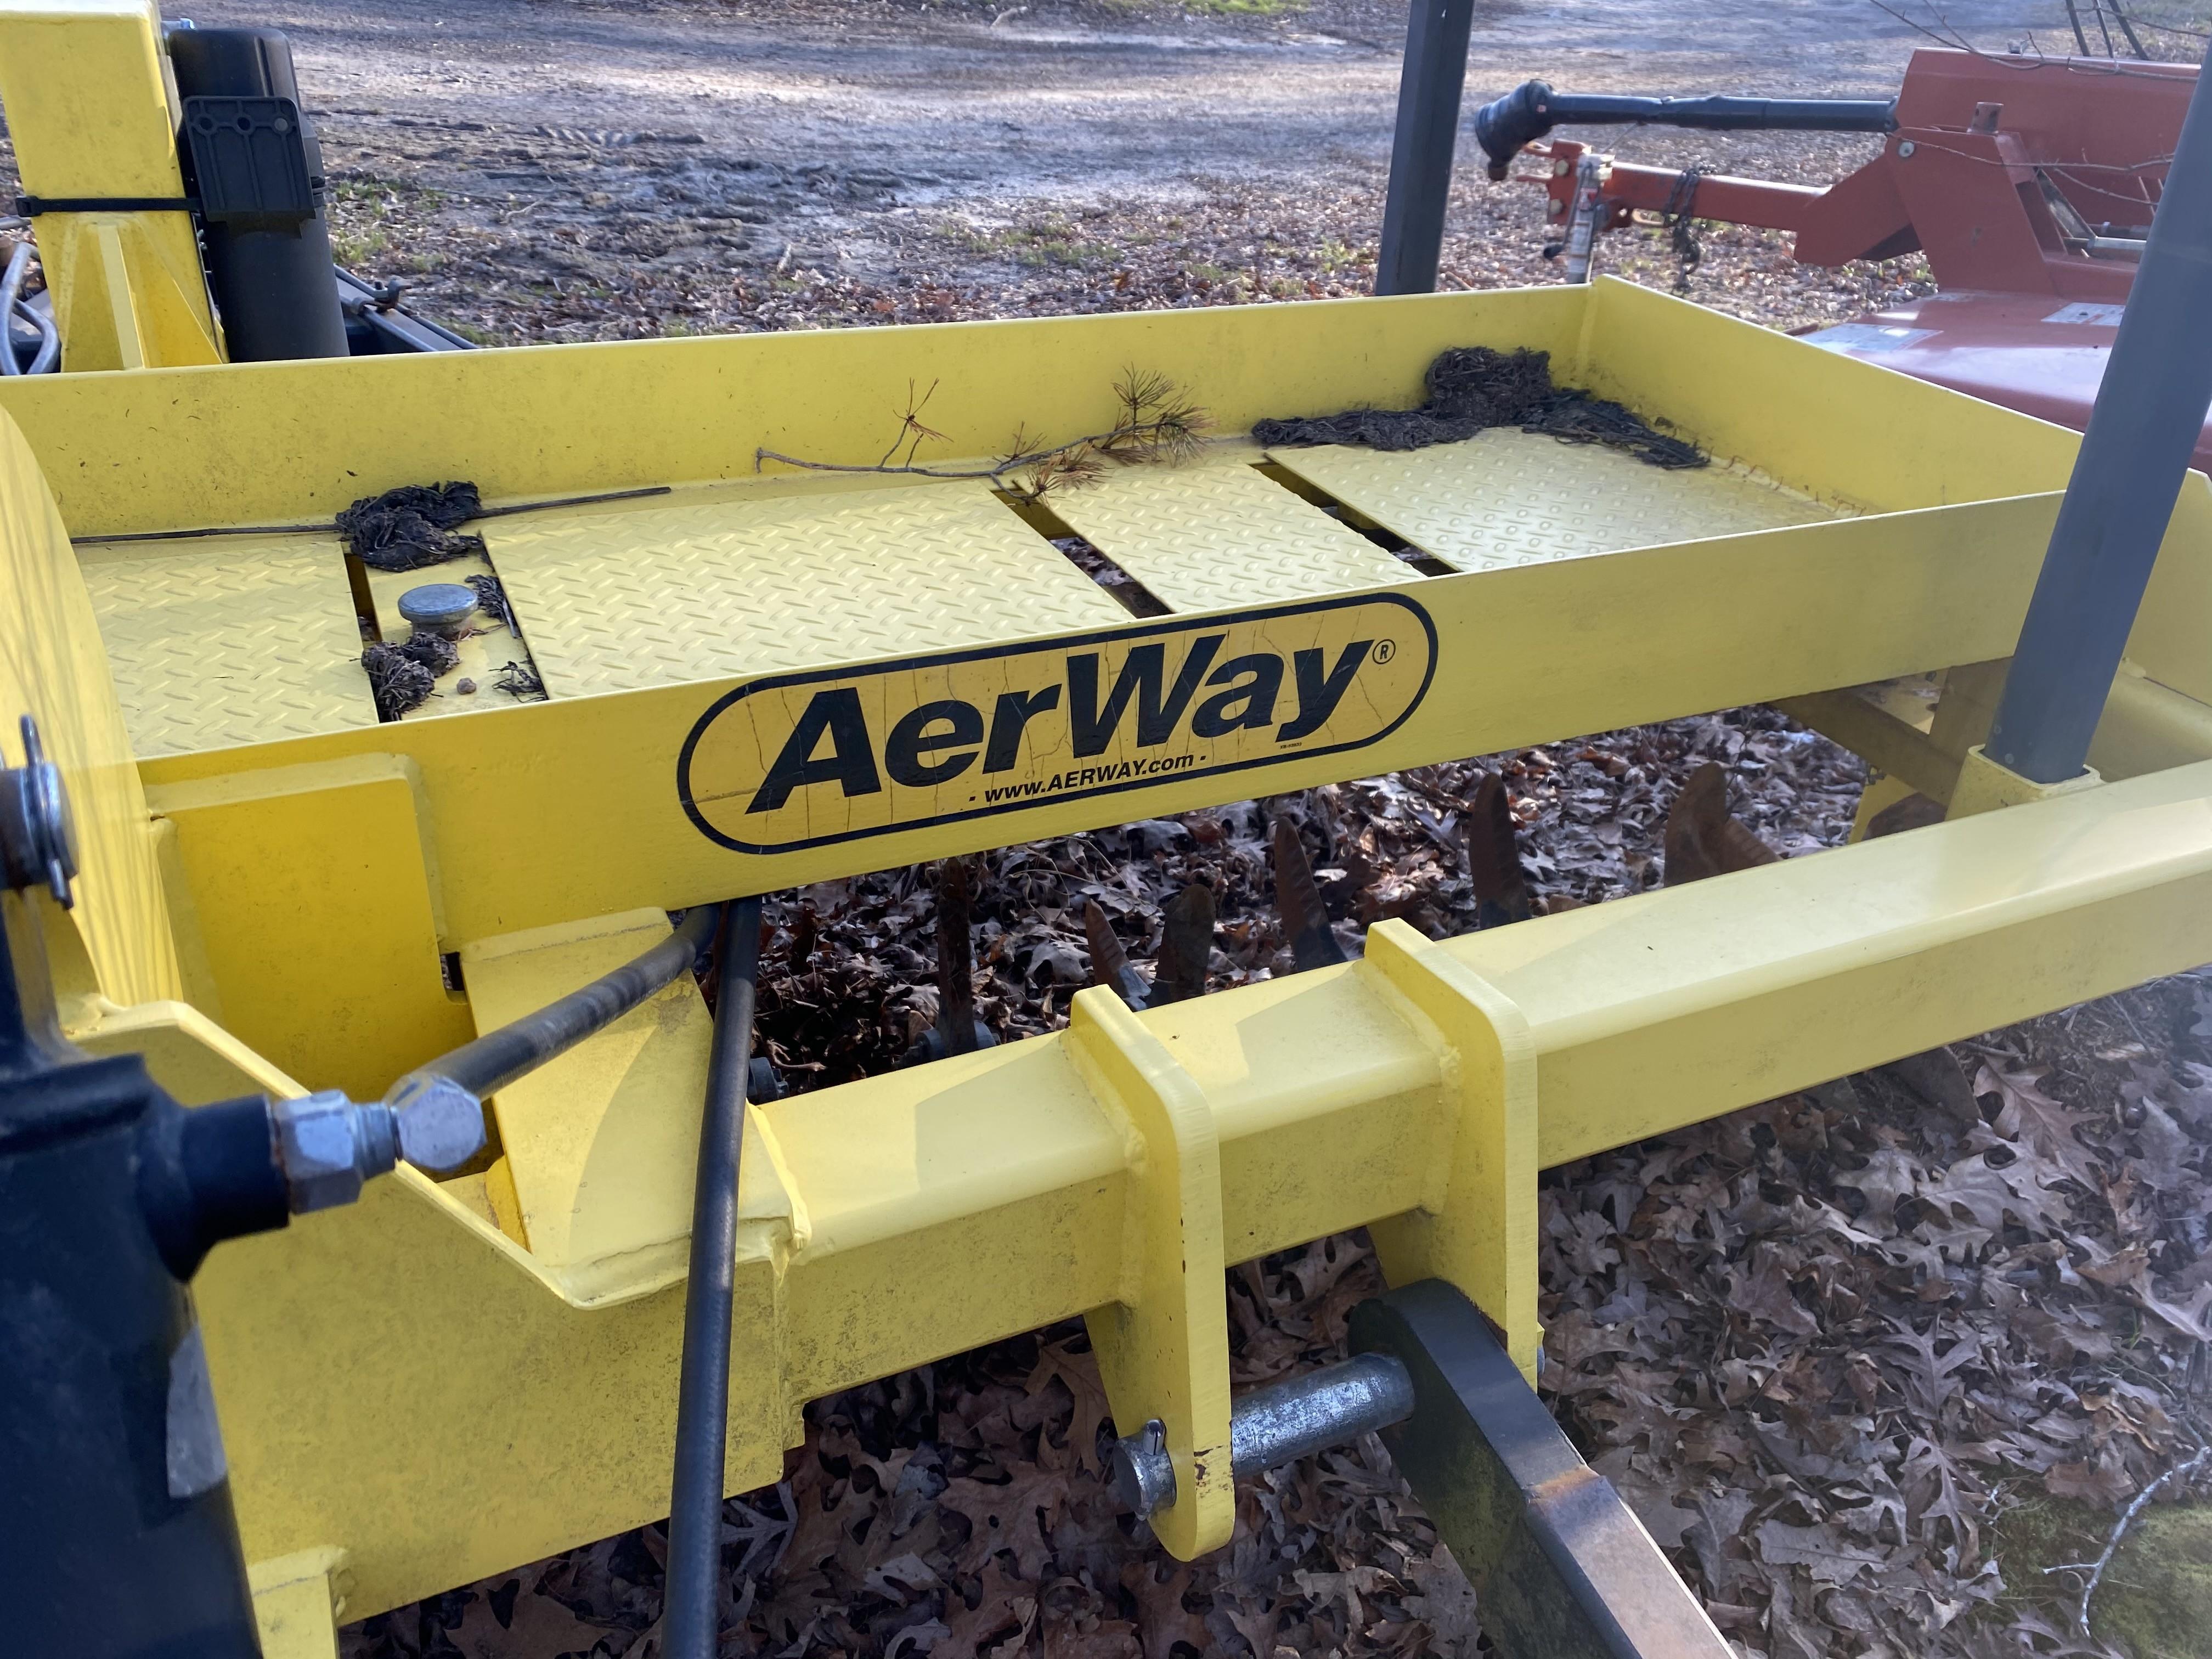 Used, 0, Aerway, AerWay , Aerators